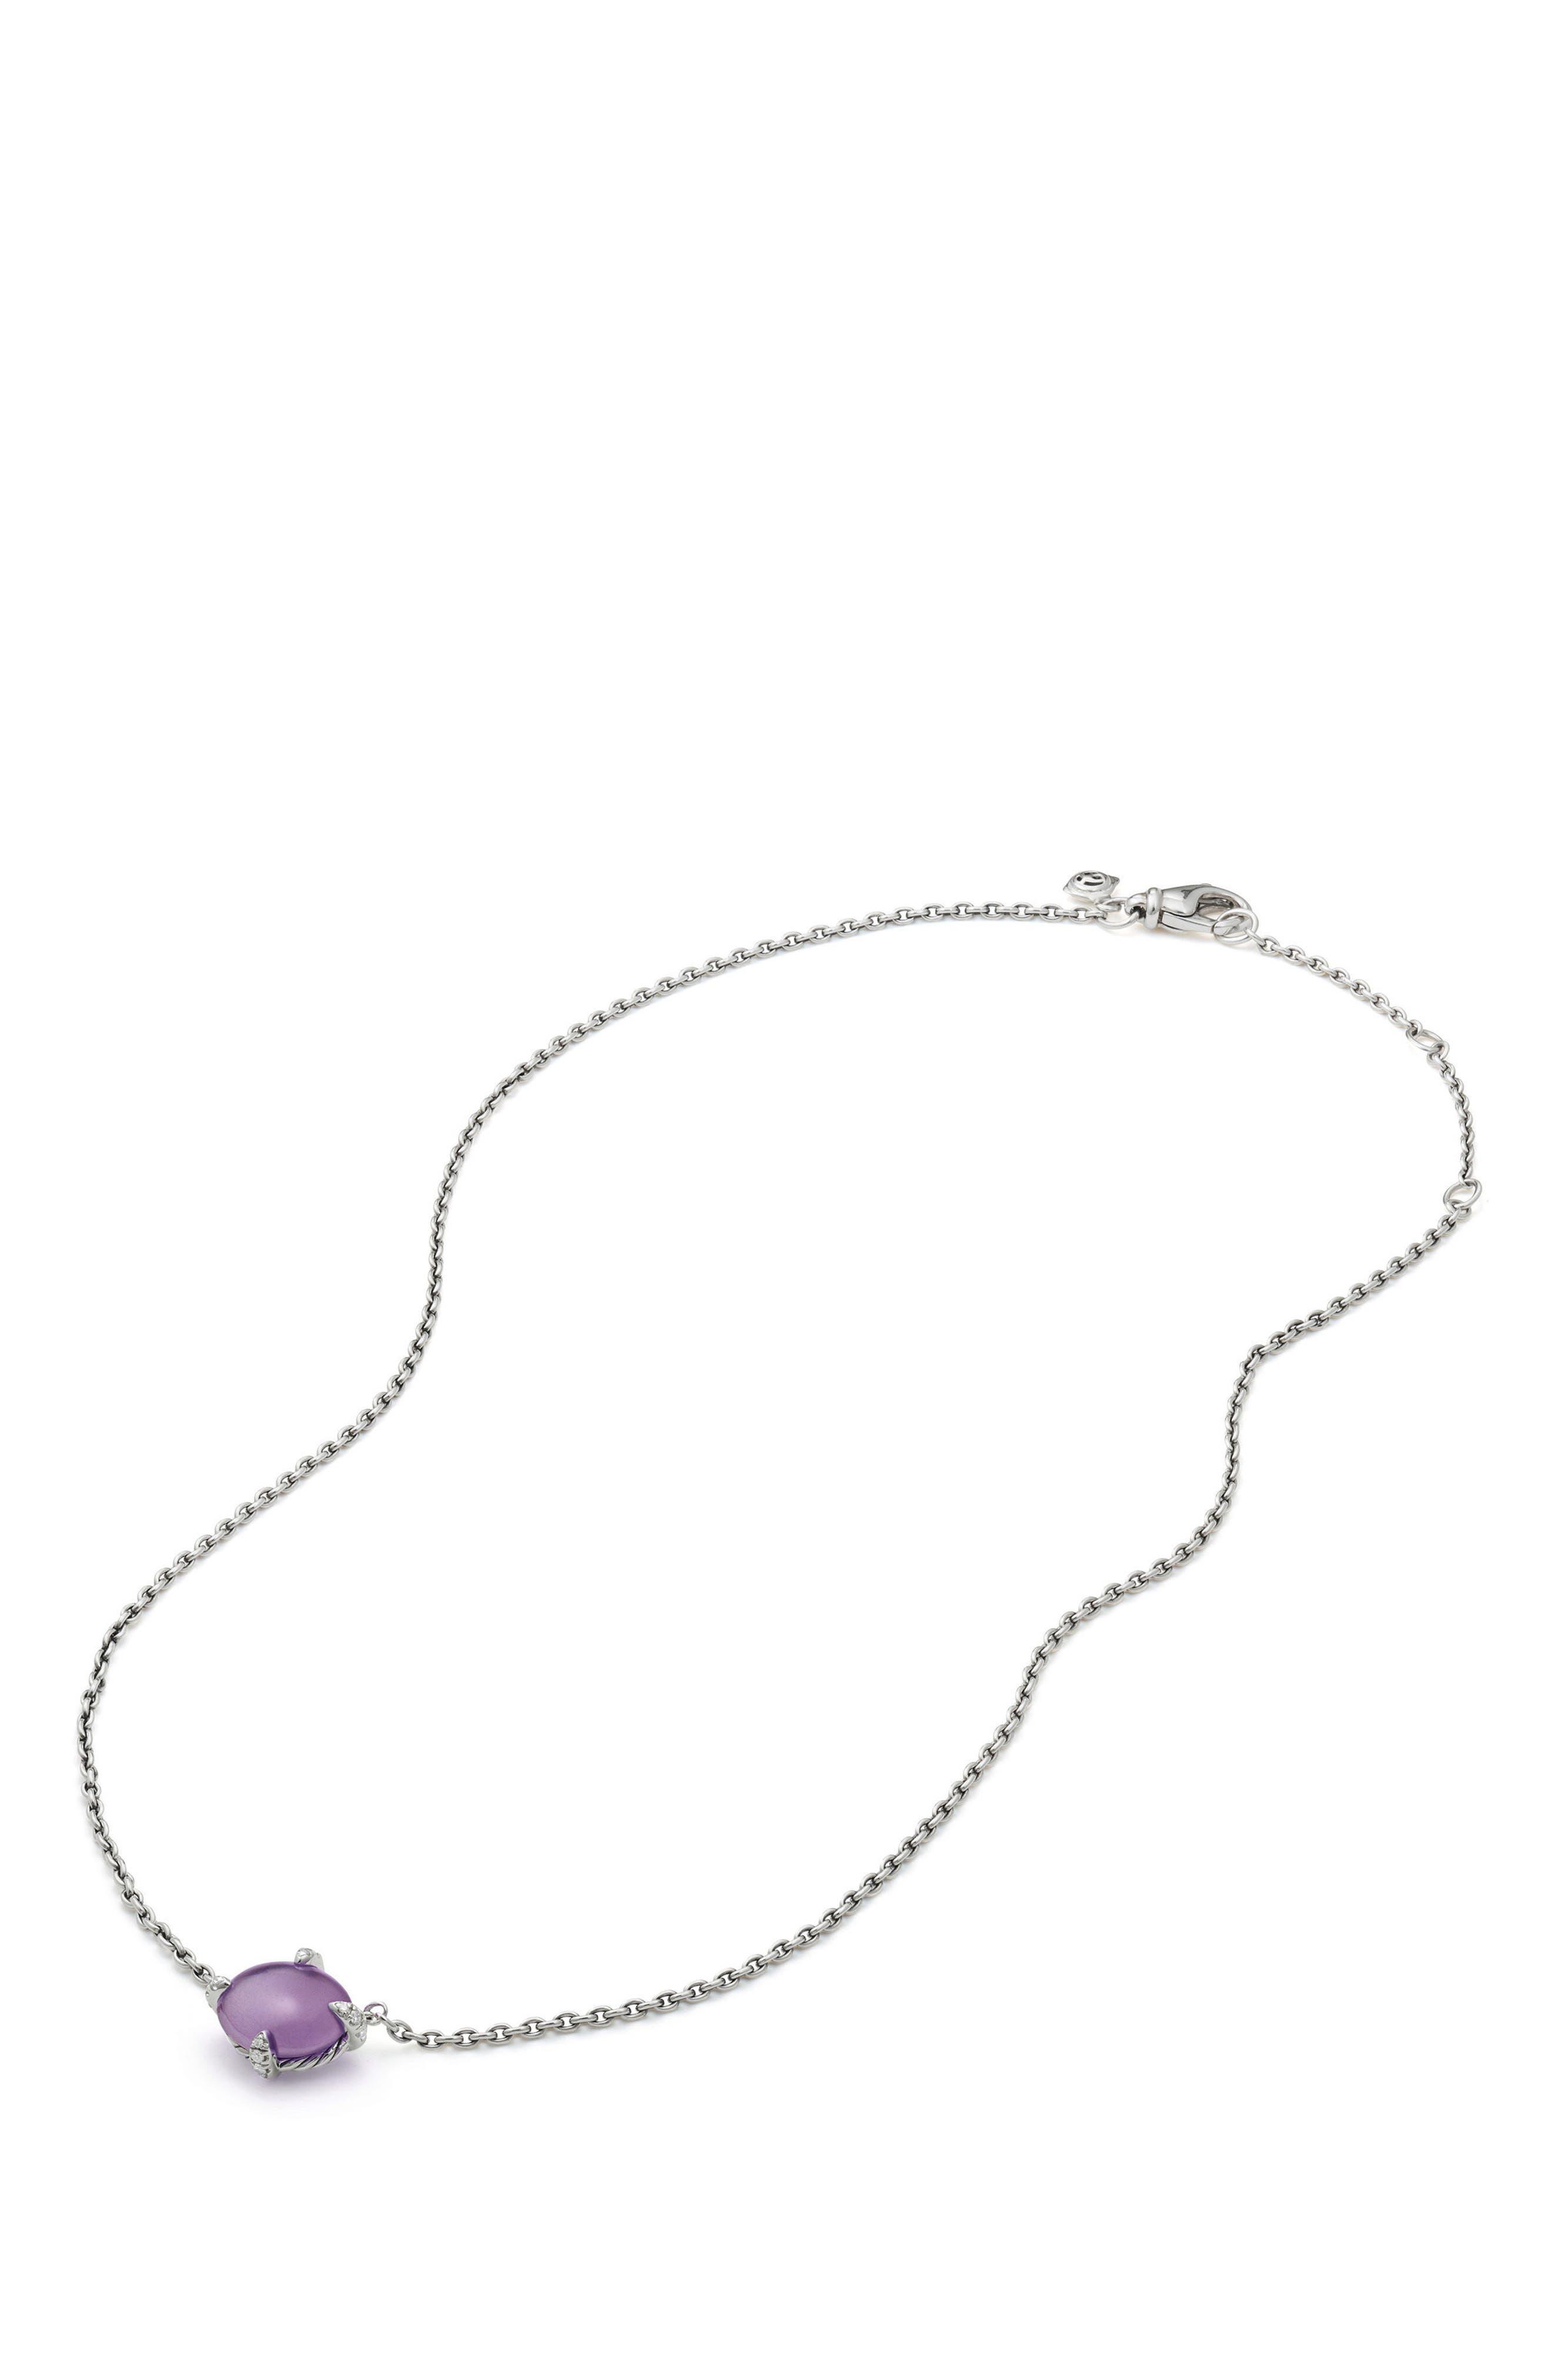 Chatelaine<sup>®</sup> Gemstone & Diamond Necklace,                             Alternate thumbnail 3, color,                             SILVER/ DIAMOND/ AMETHYST